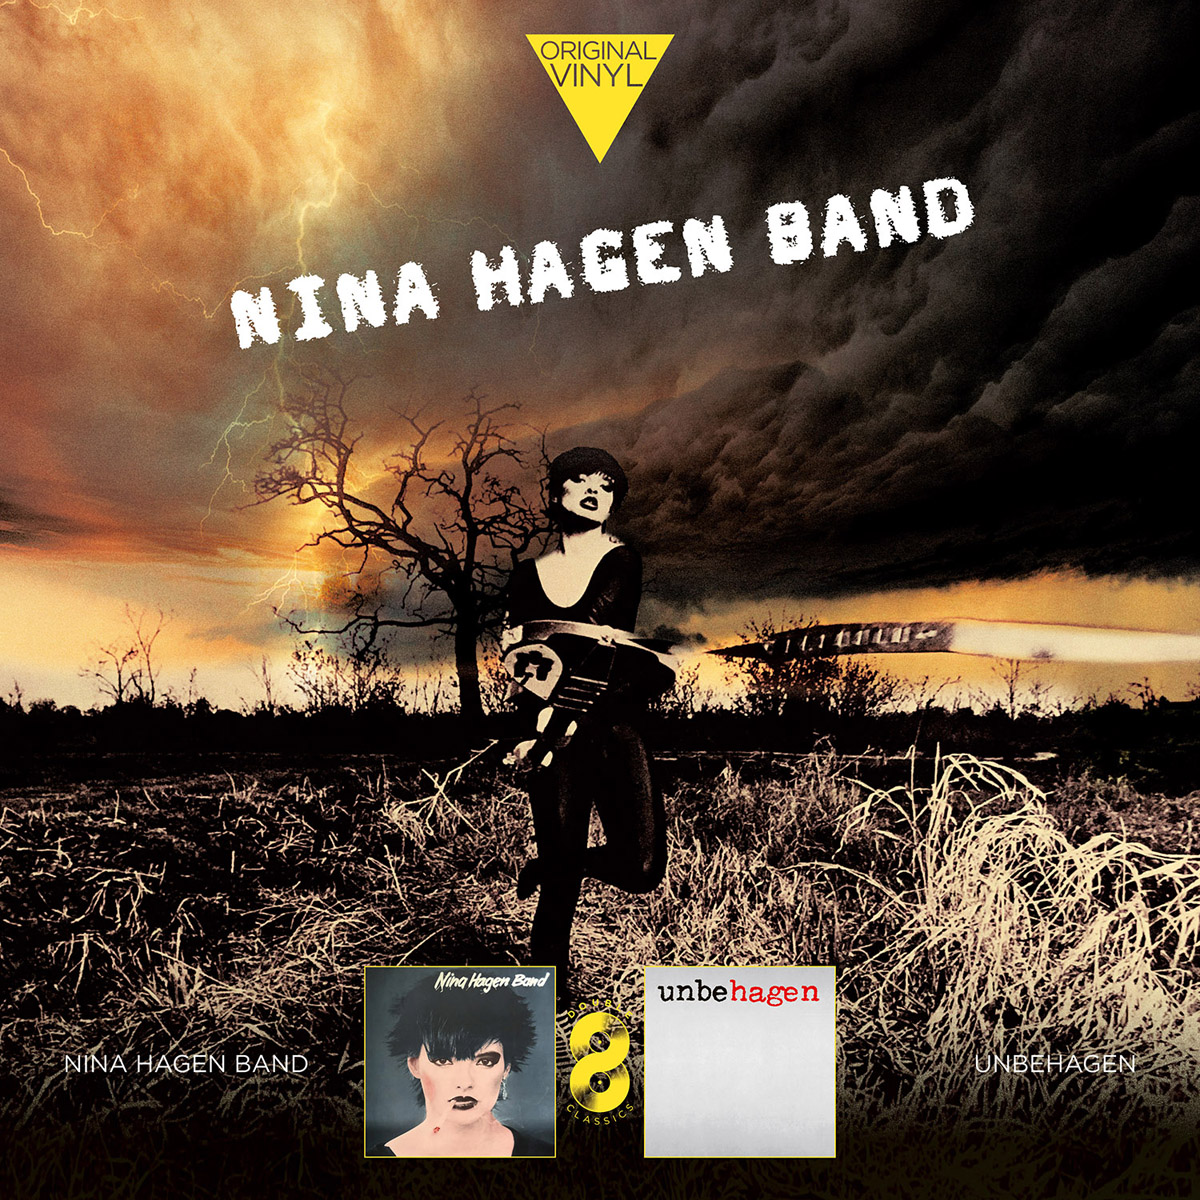 Nina Hagen Band Nina Hagen Band. Original Vinyl Classics: Nina Hagen Band + Unbehagen (2 LP) mehbooba band mehbooba band fanfare de calcutta